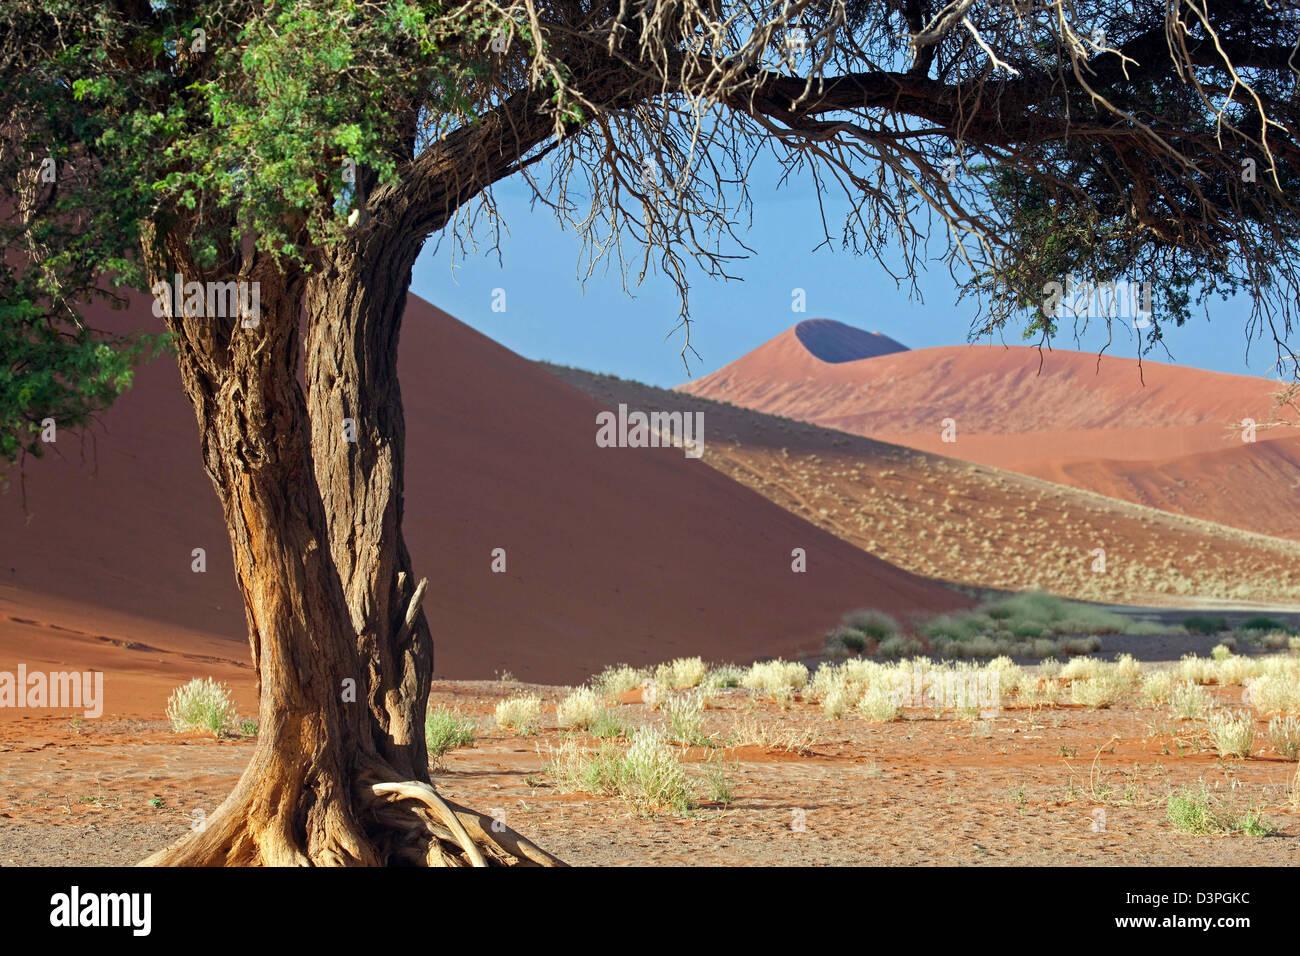 Acacia tree in the Namib desert at Sossusvlei, Namib-Naukluft, Namibia, South Africa - Stock Image